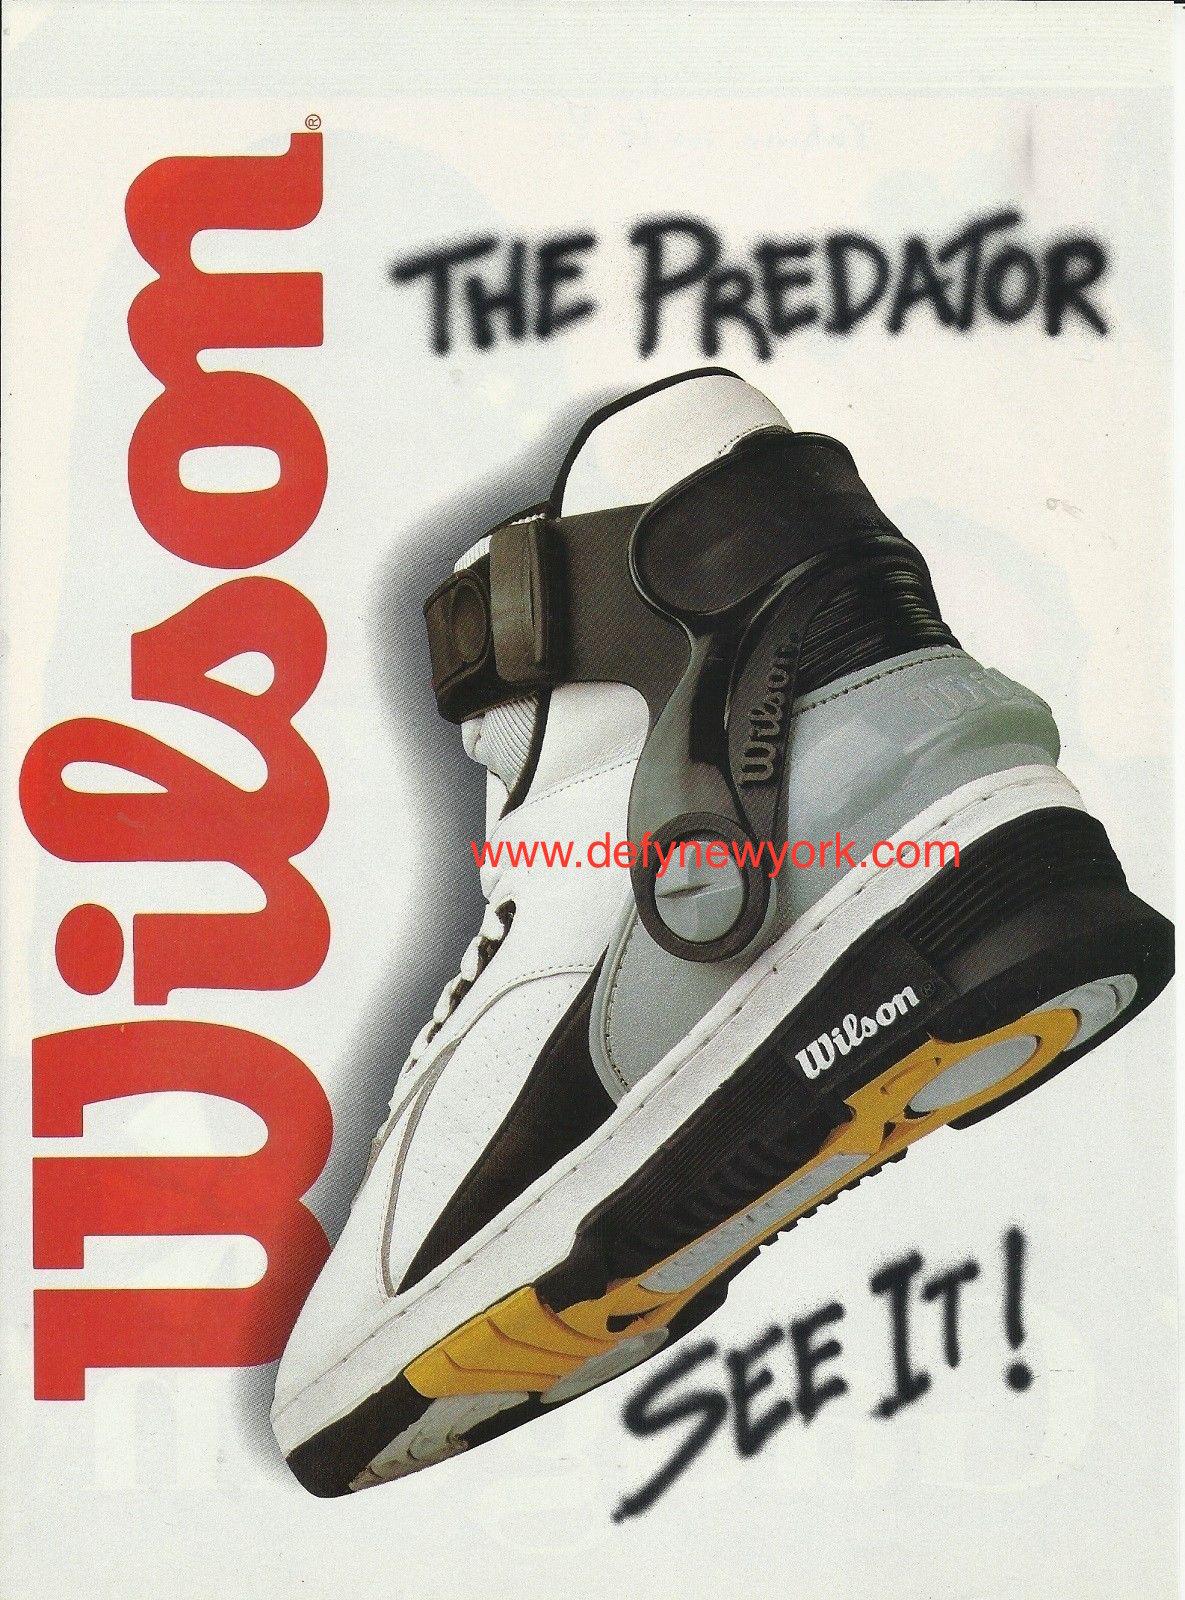 6317b5e5006e These Wilson Basketball Shoes Are WOW. The Wilson Predator ...